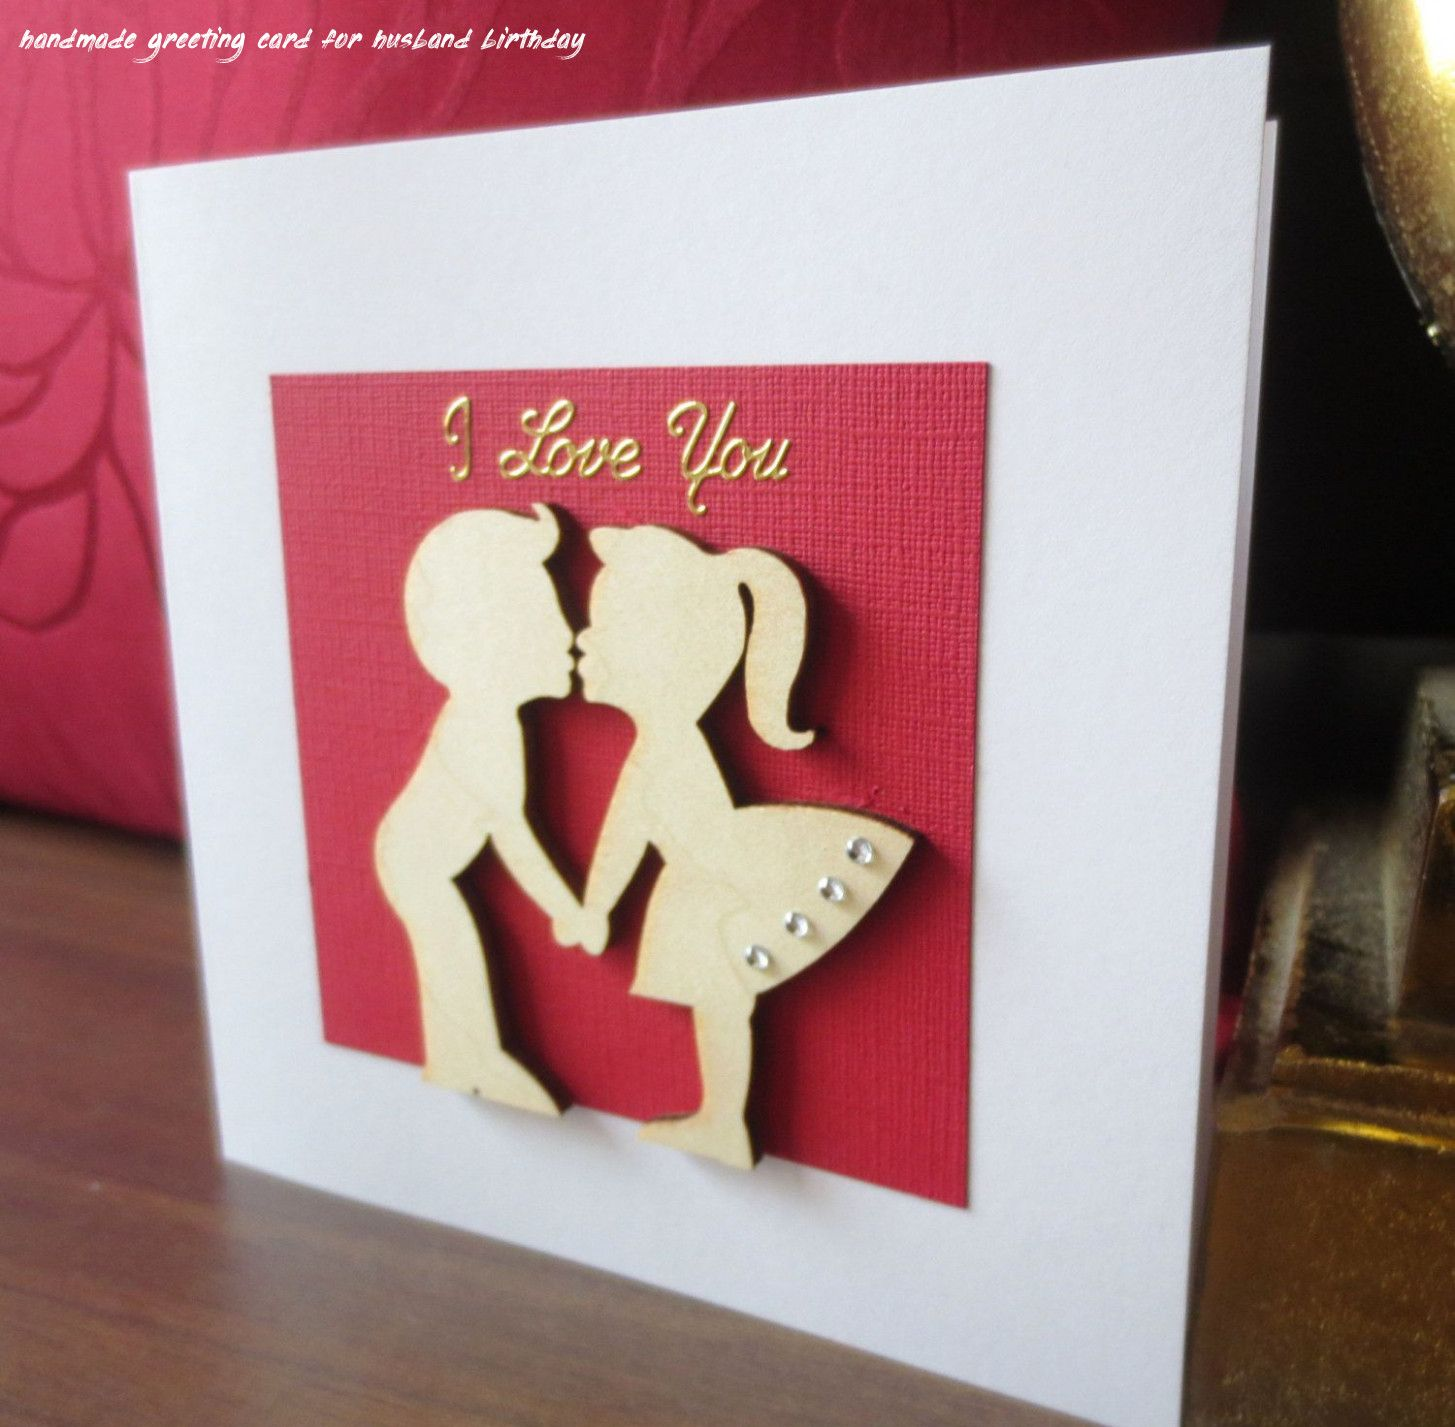 6 Handmade Greeting Card For Husband Birthday Anniversary Cards Handmade Greeting Cards Handmade Valentine Cards Handmade